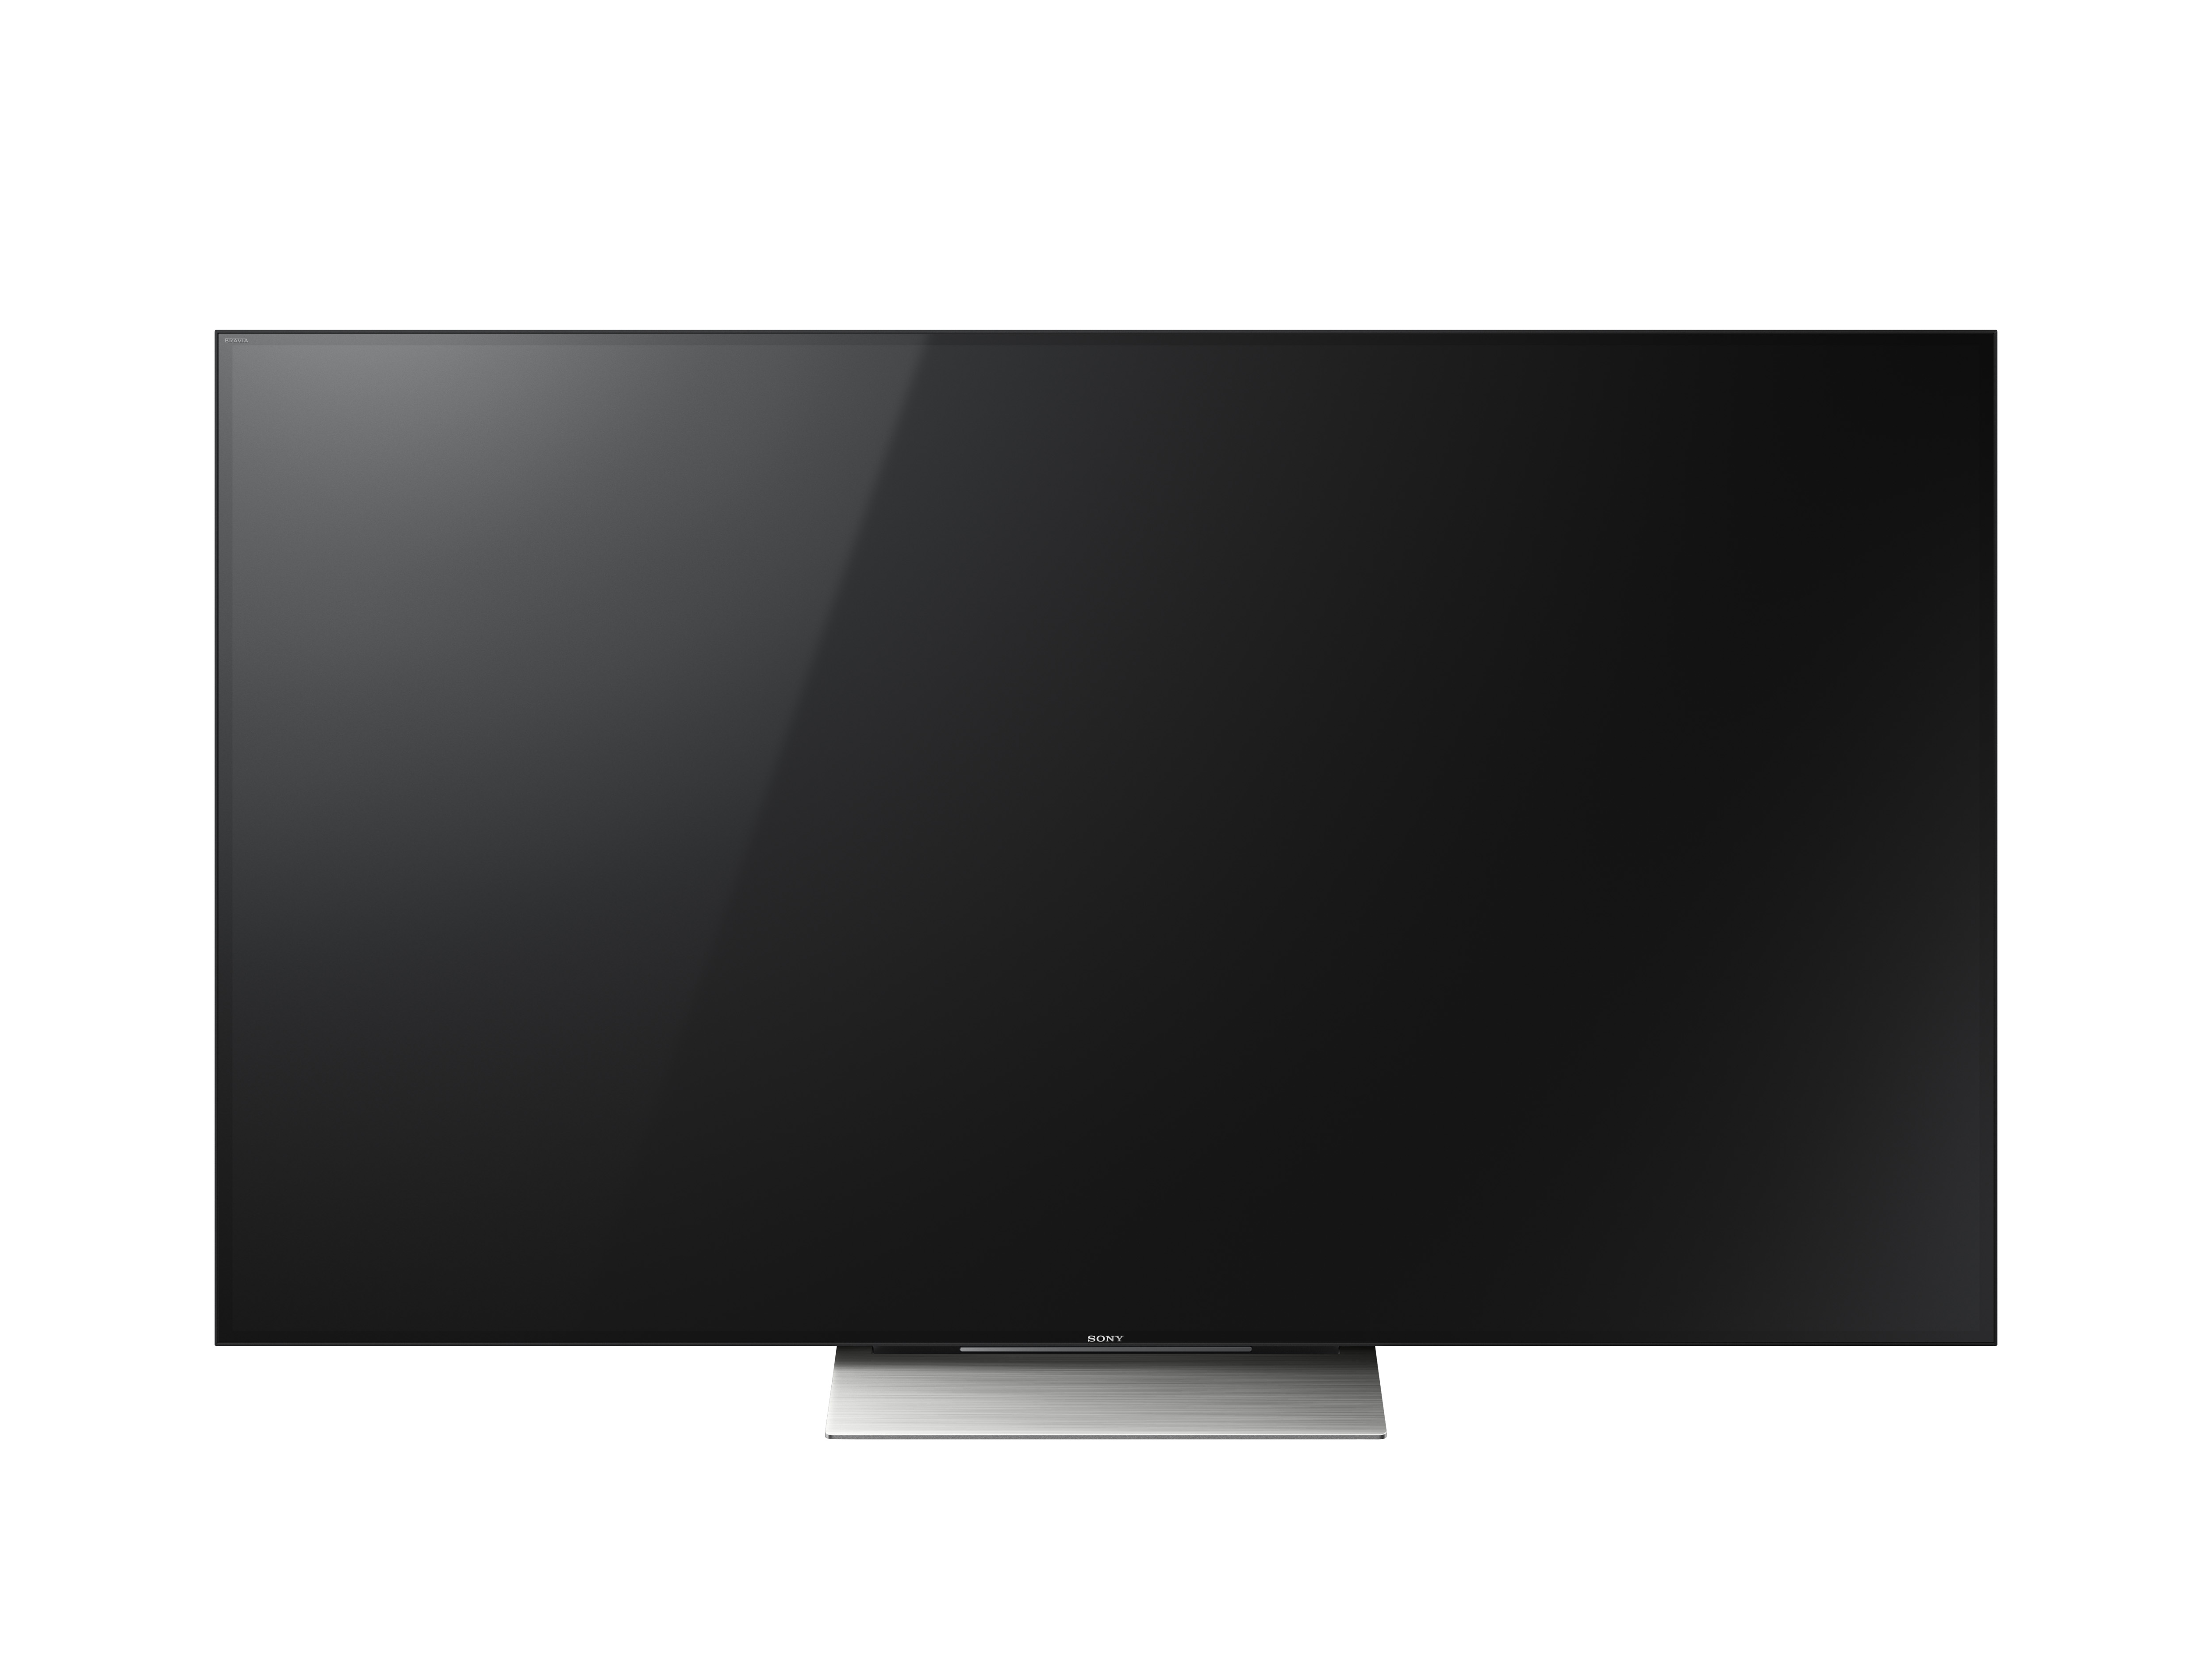 sony banks on hdr better contrast in 2016 bravia 4k tvs techgoondu techgoondu. Black Bedroom Furniture Sets. Home Design Ideas